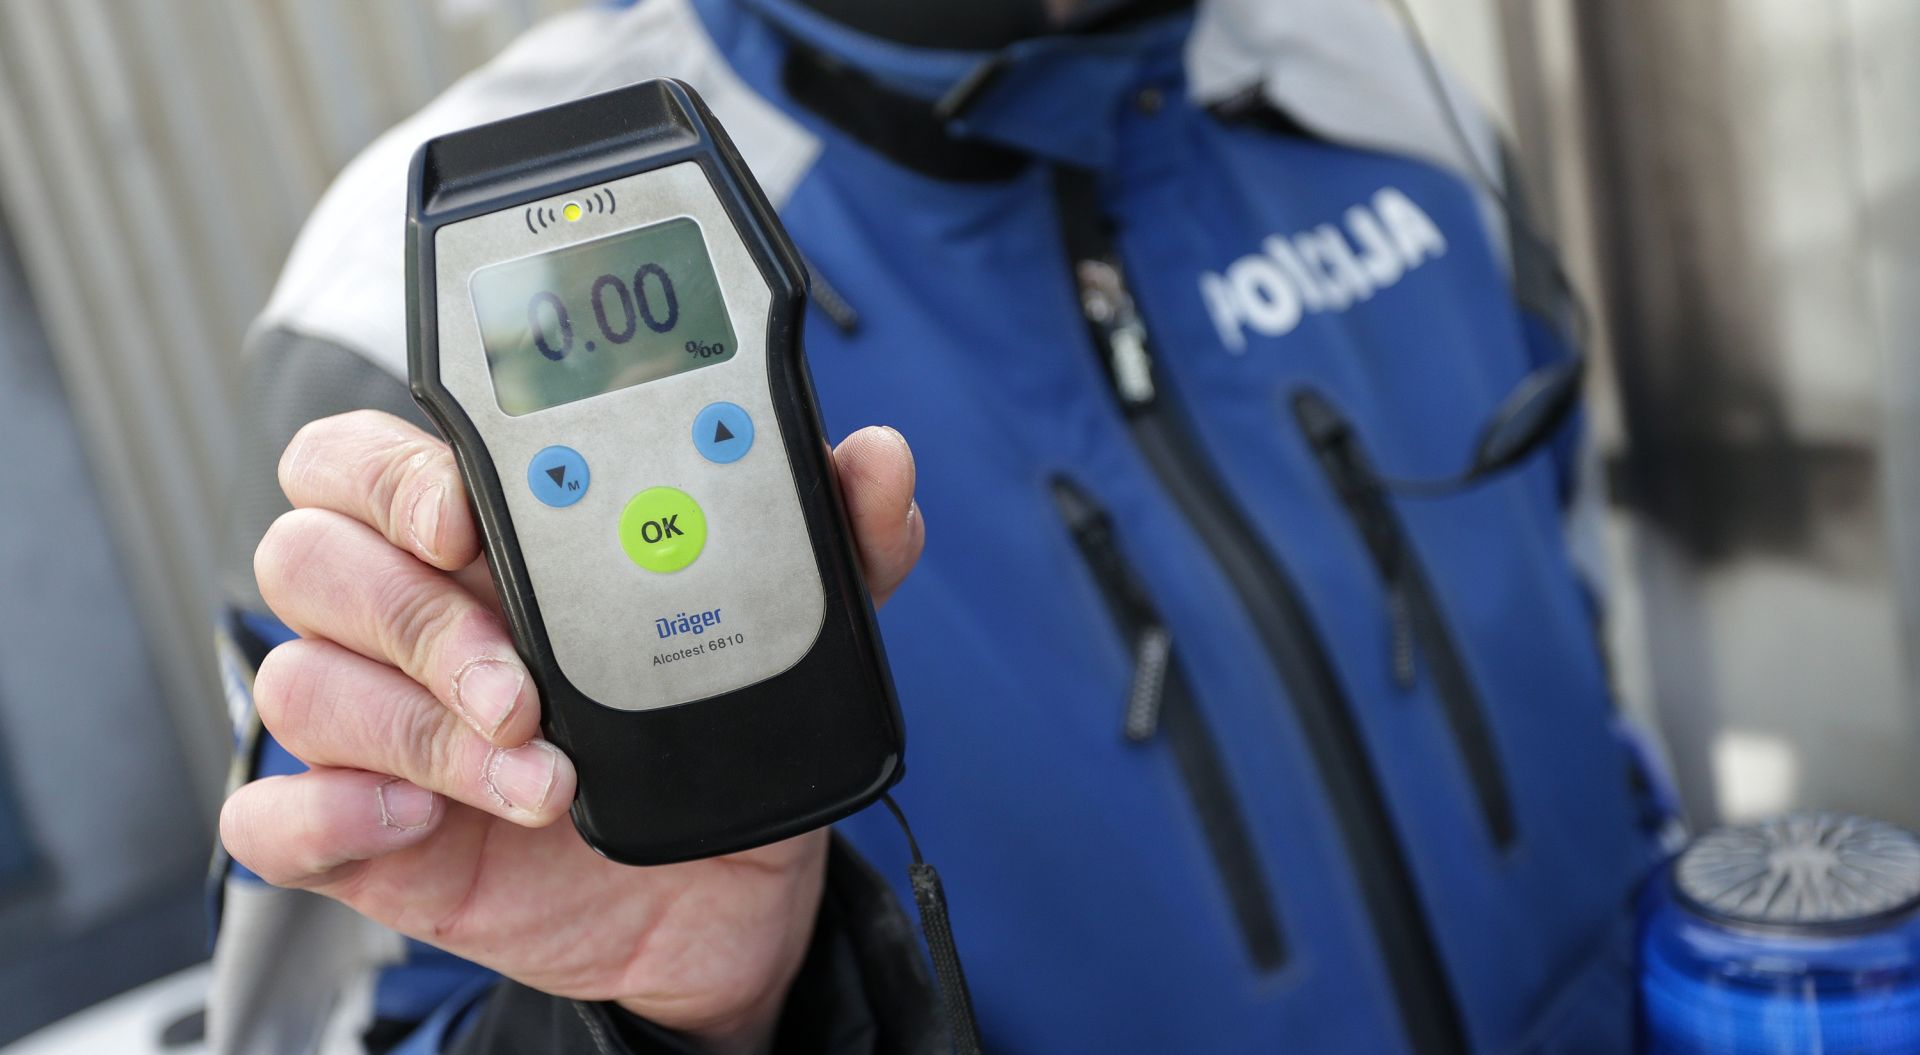 ZAGREB Pojačani nadzor alkohola, droge i brzine